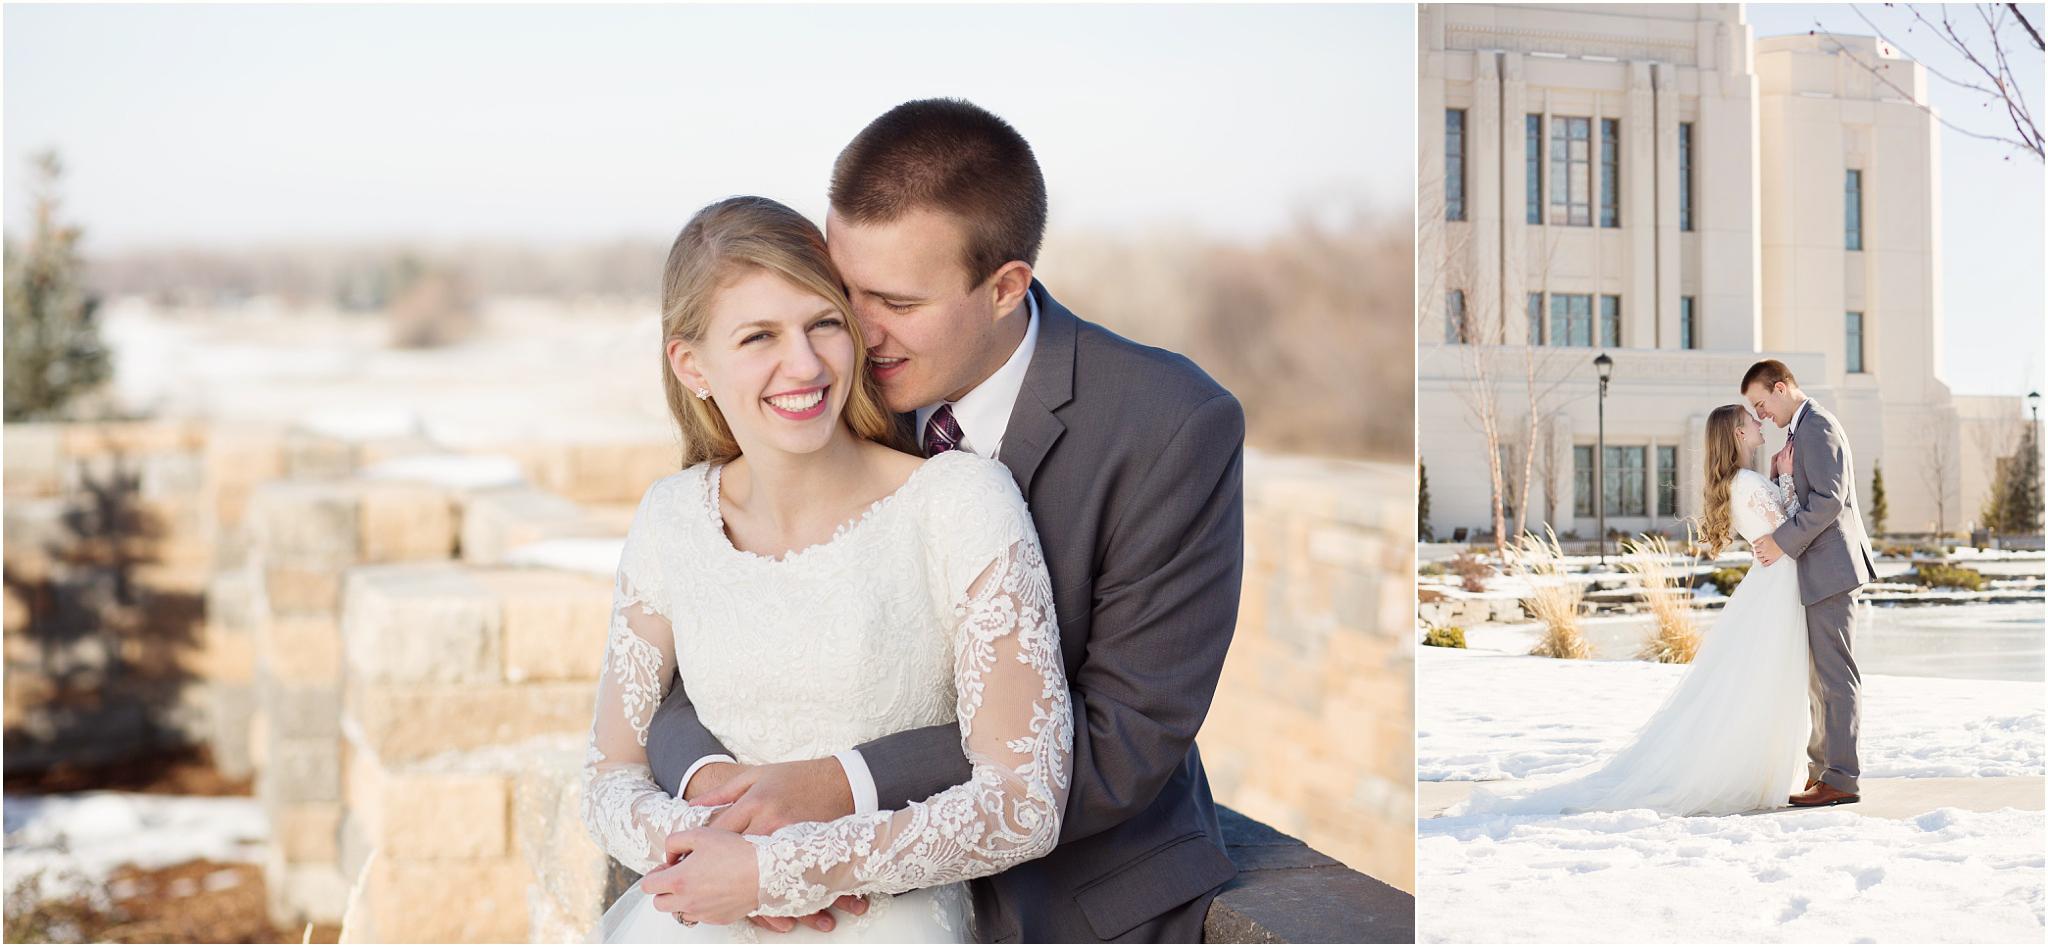 Wedding Photography_Meridian Idaho Temple_Boise Idaho_Leah Southwick Photography_0008.jpg